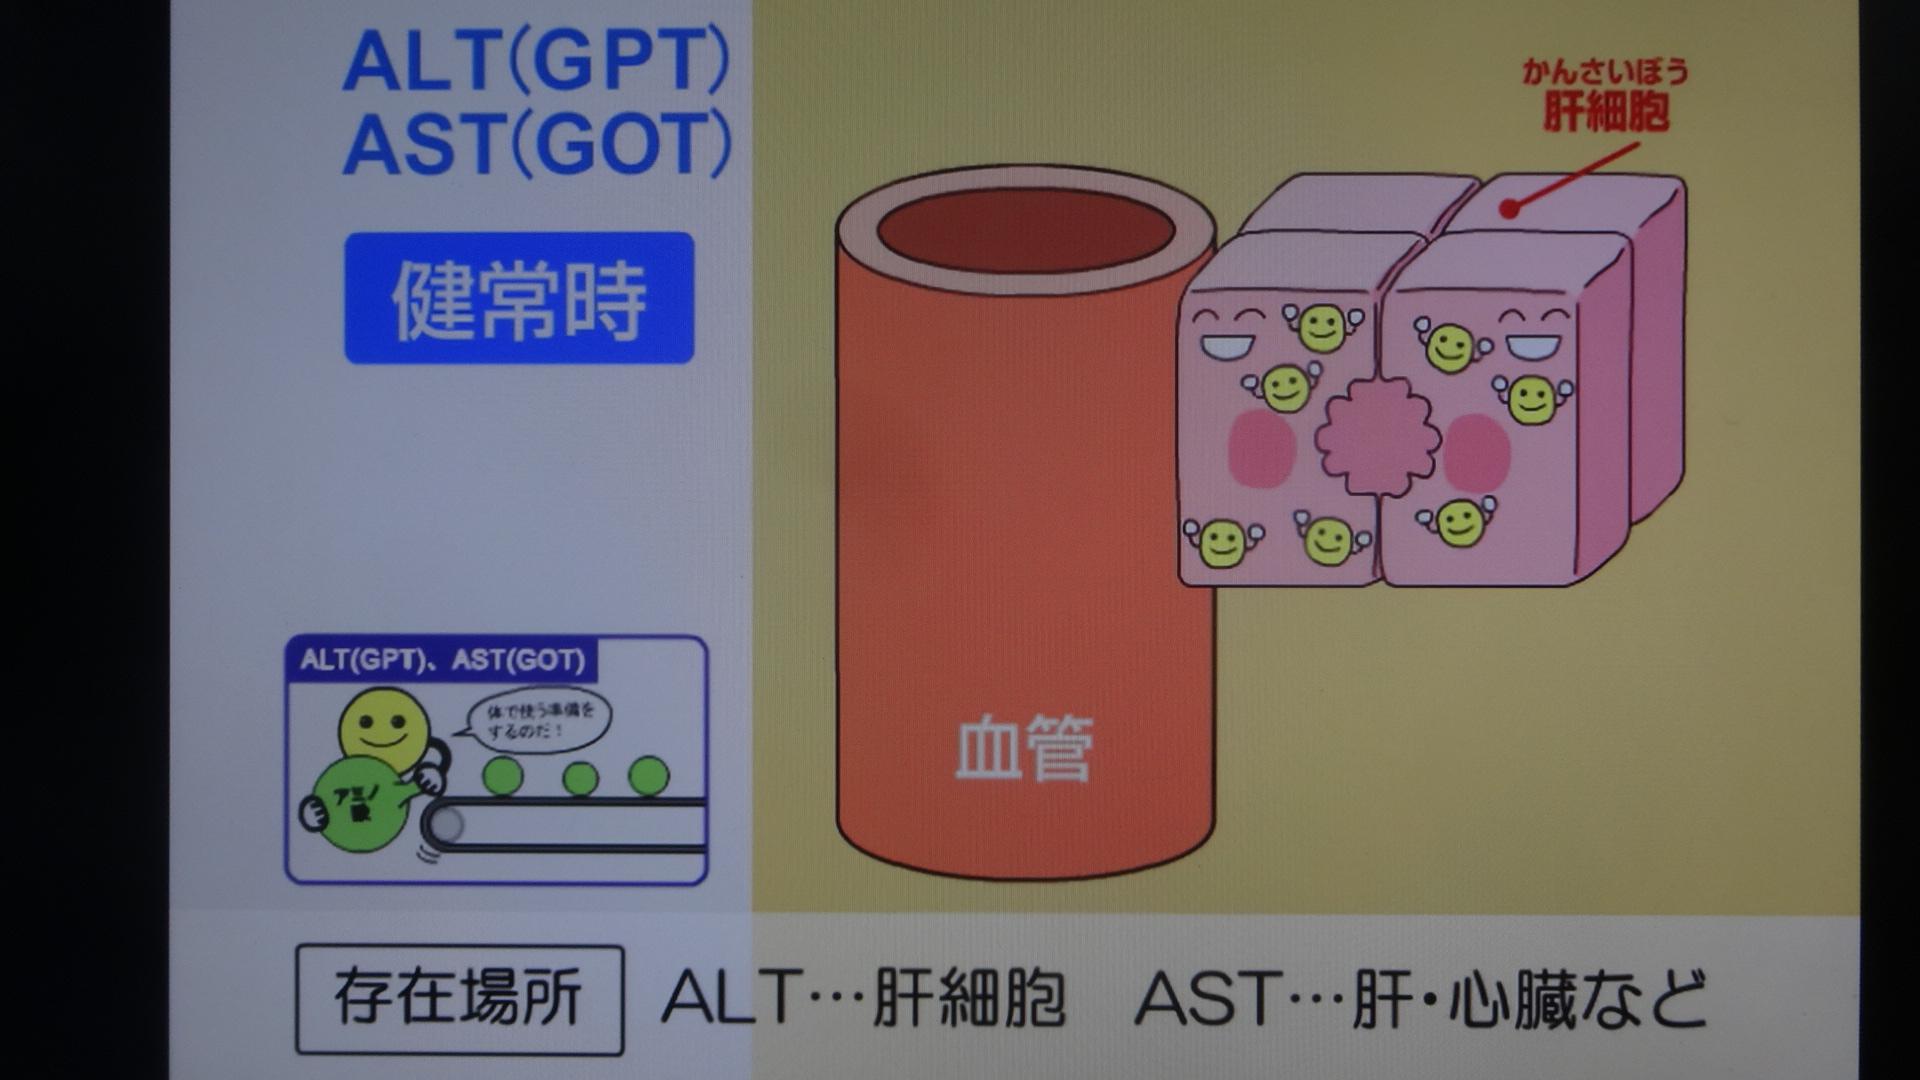 AST ALTは普段は細胞の中で働いていることを示す図